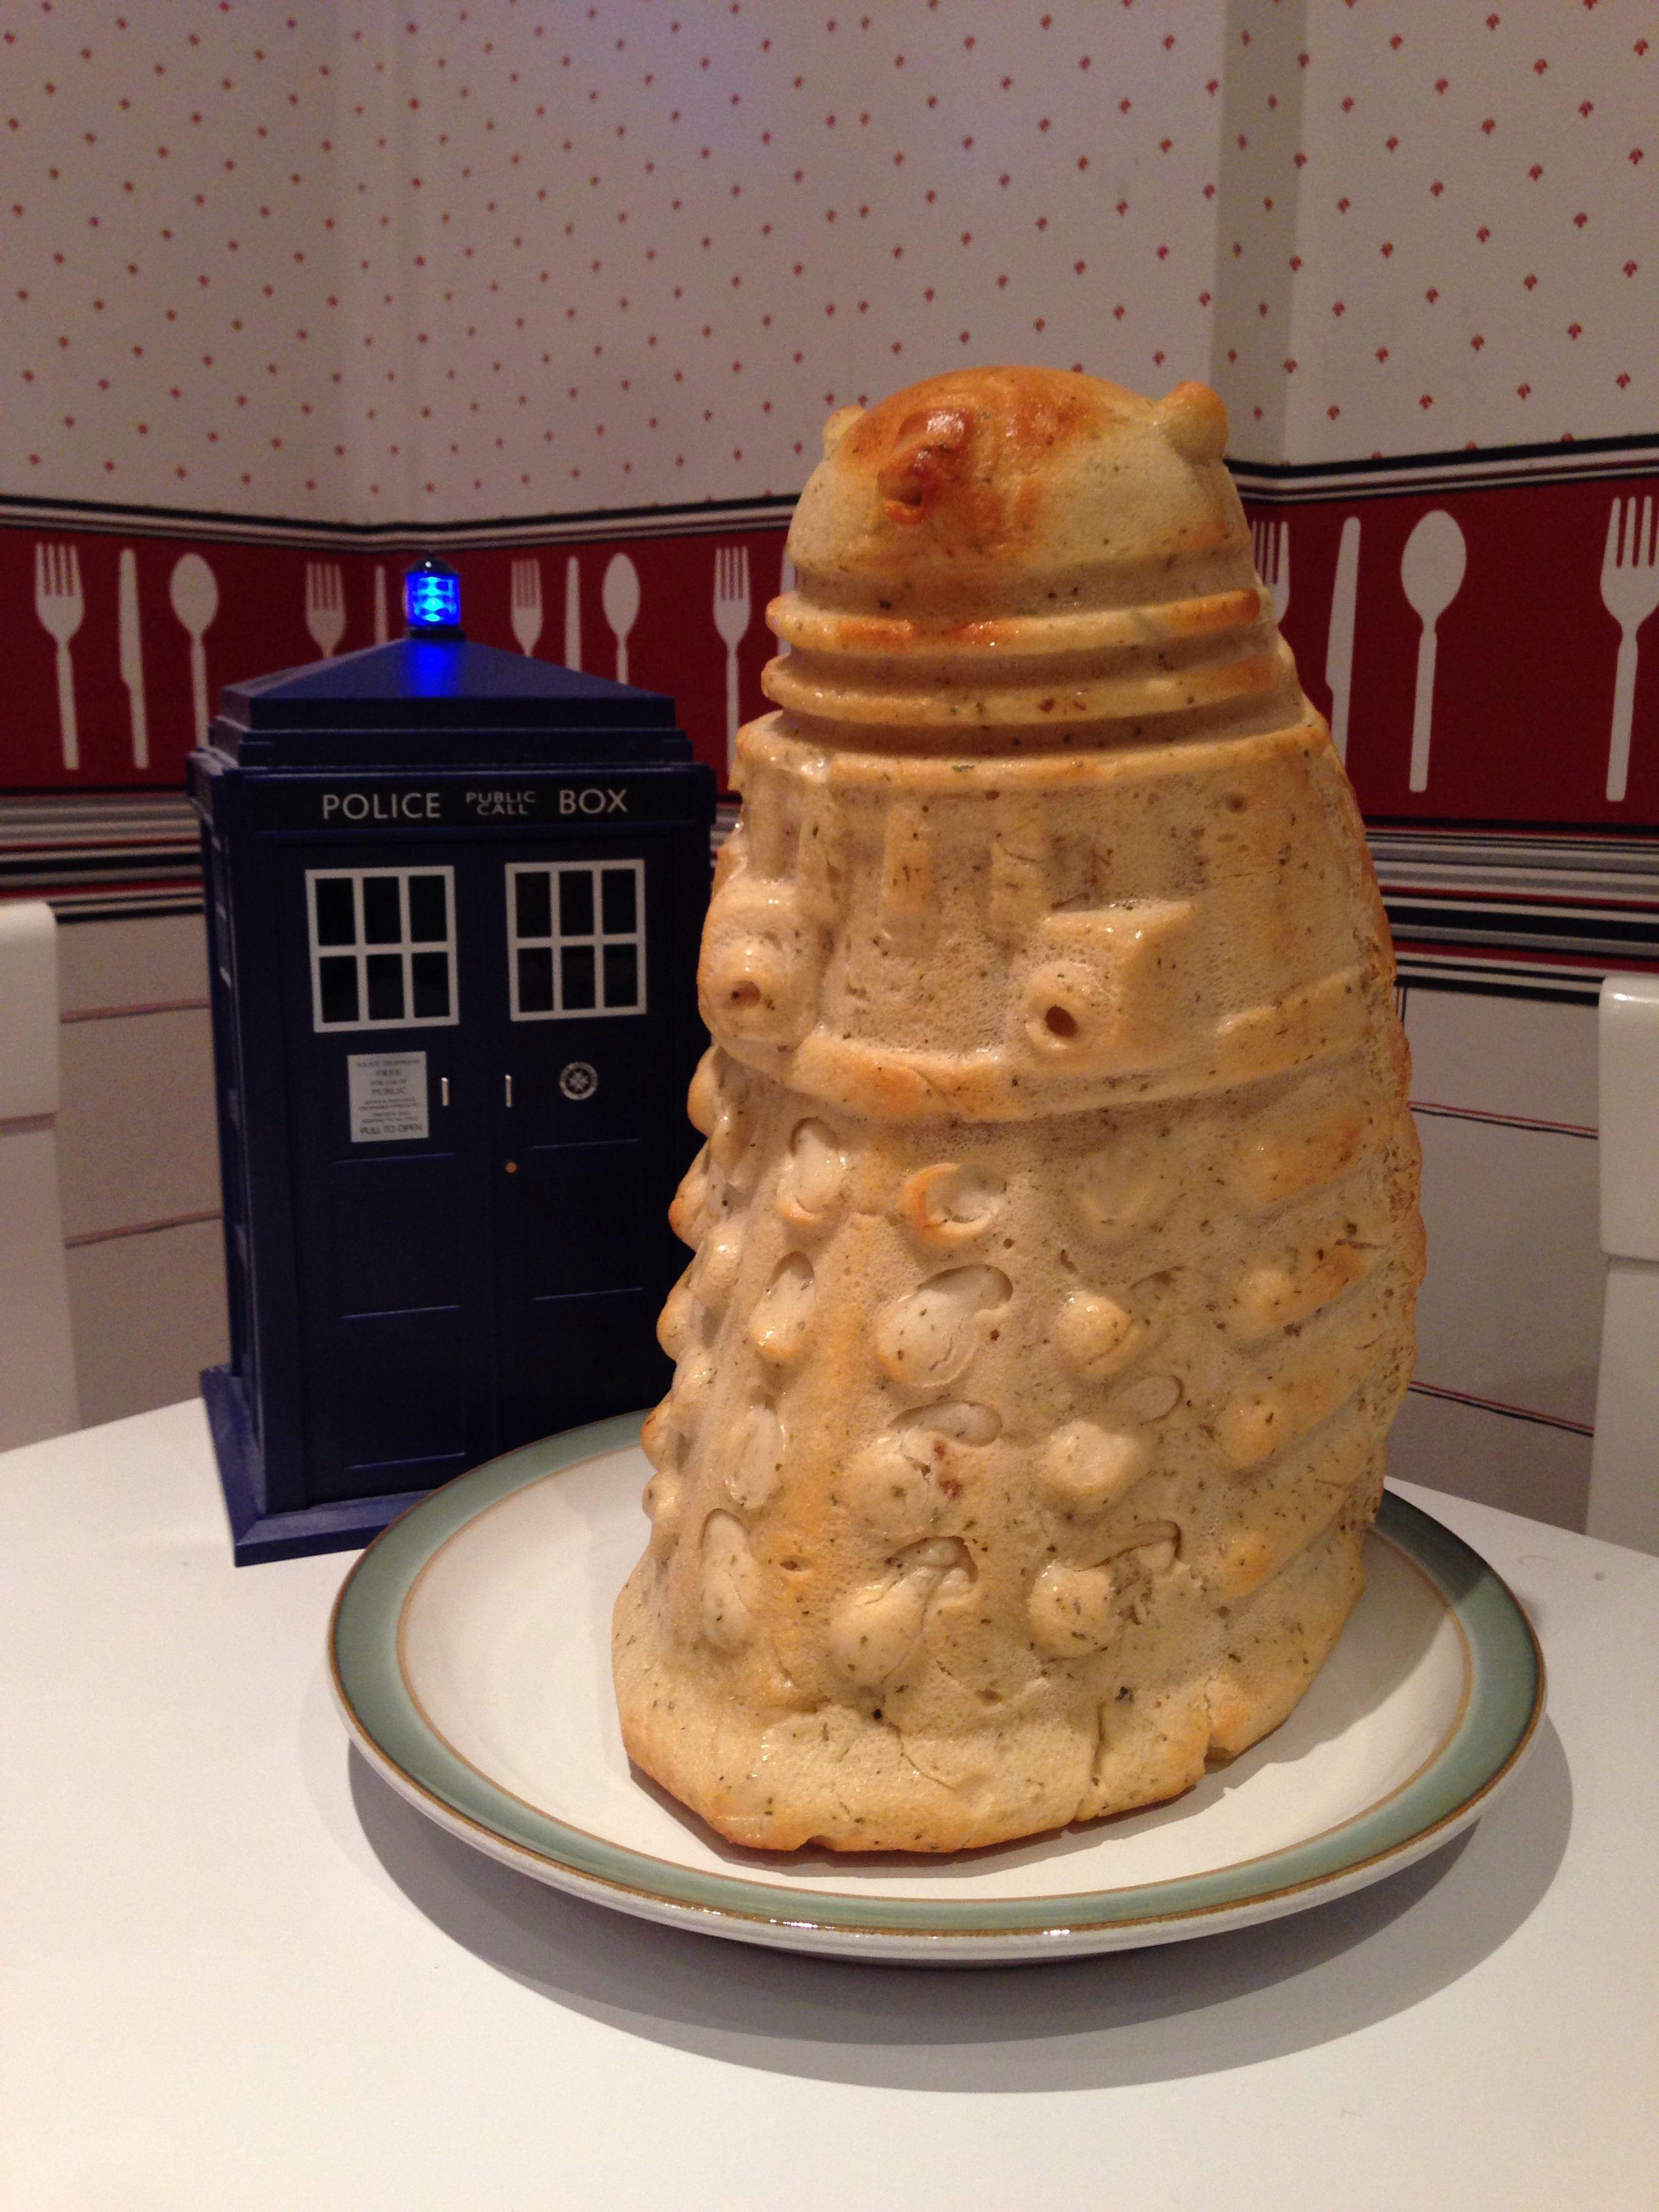 Garlic Dalek bread I just made... The recipe can be found